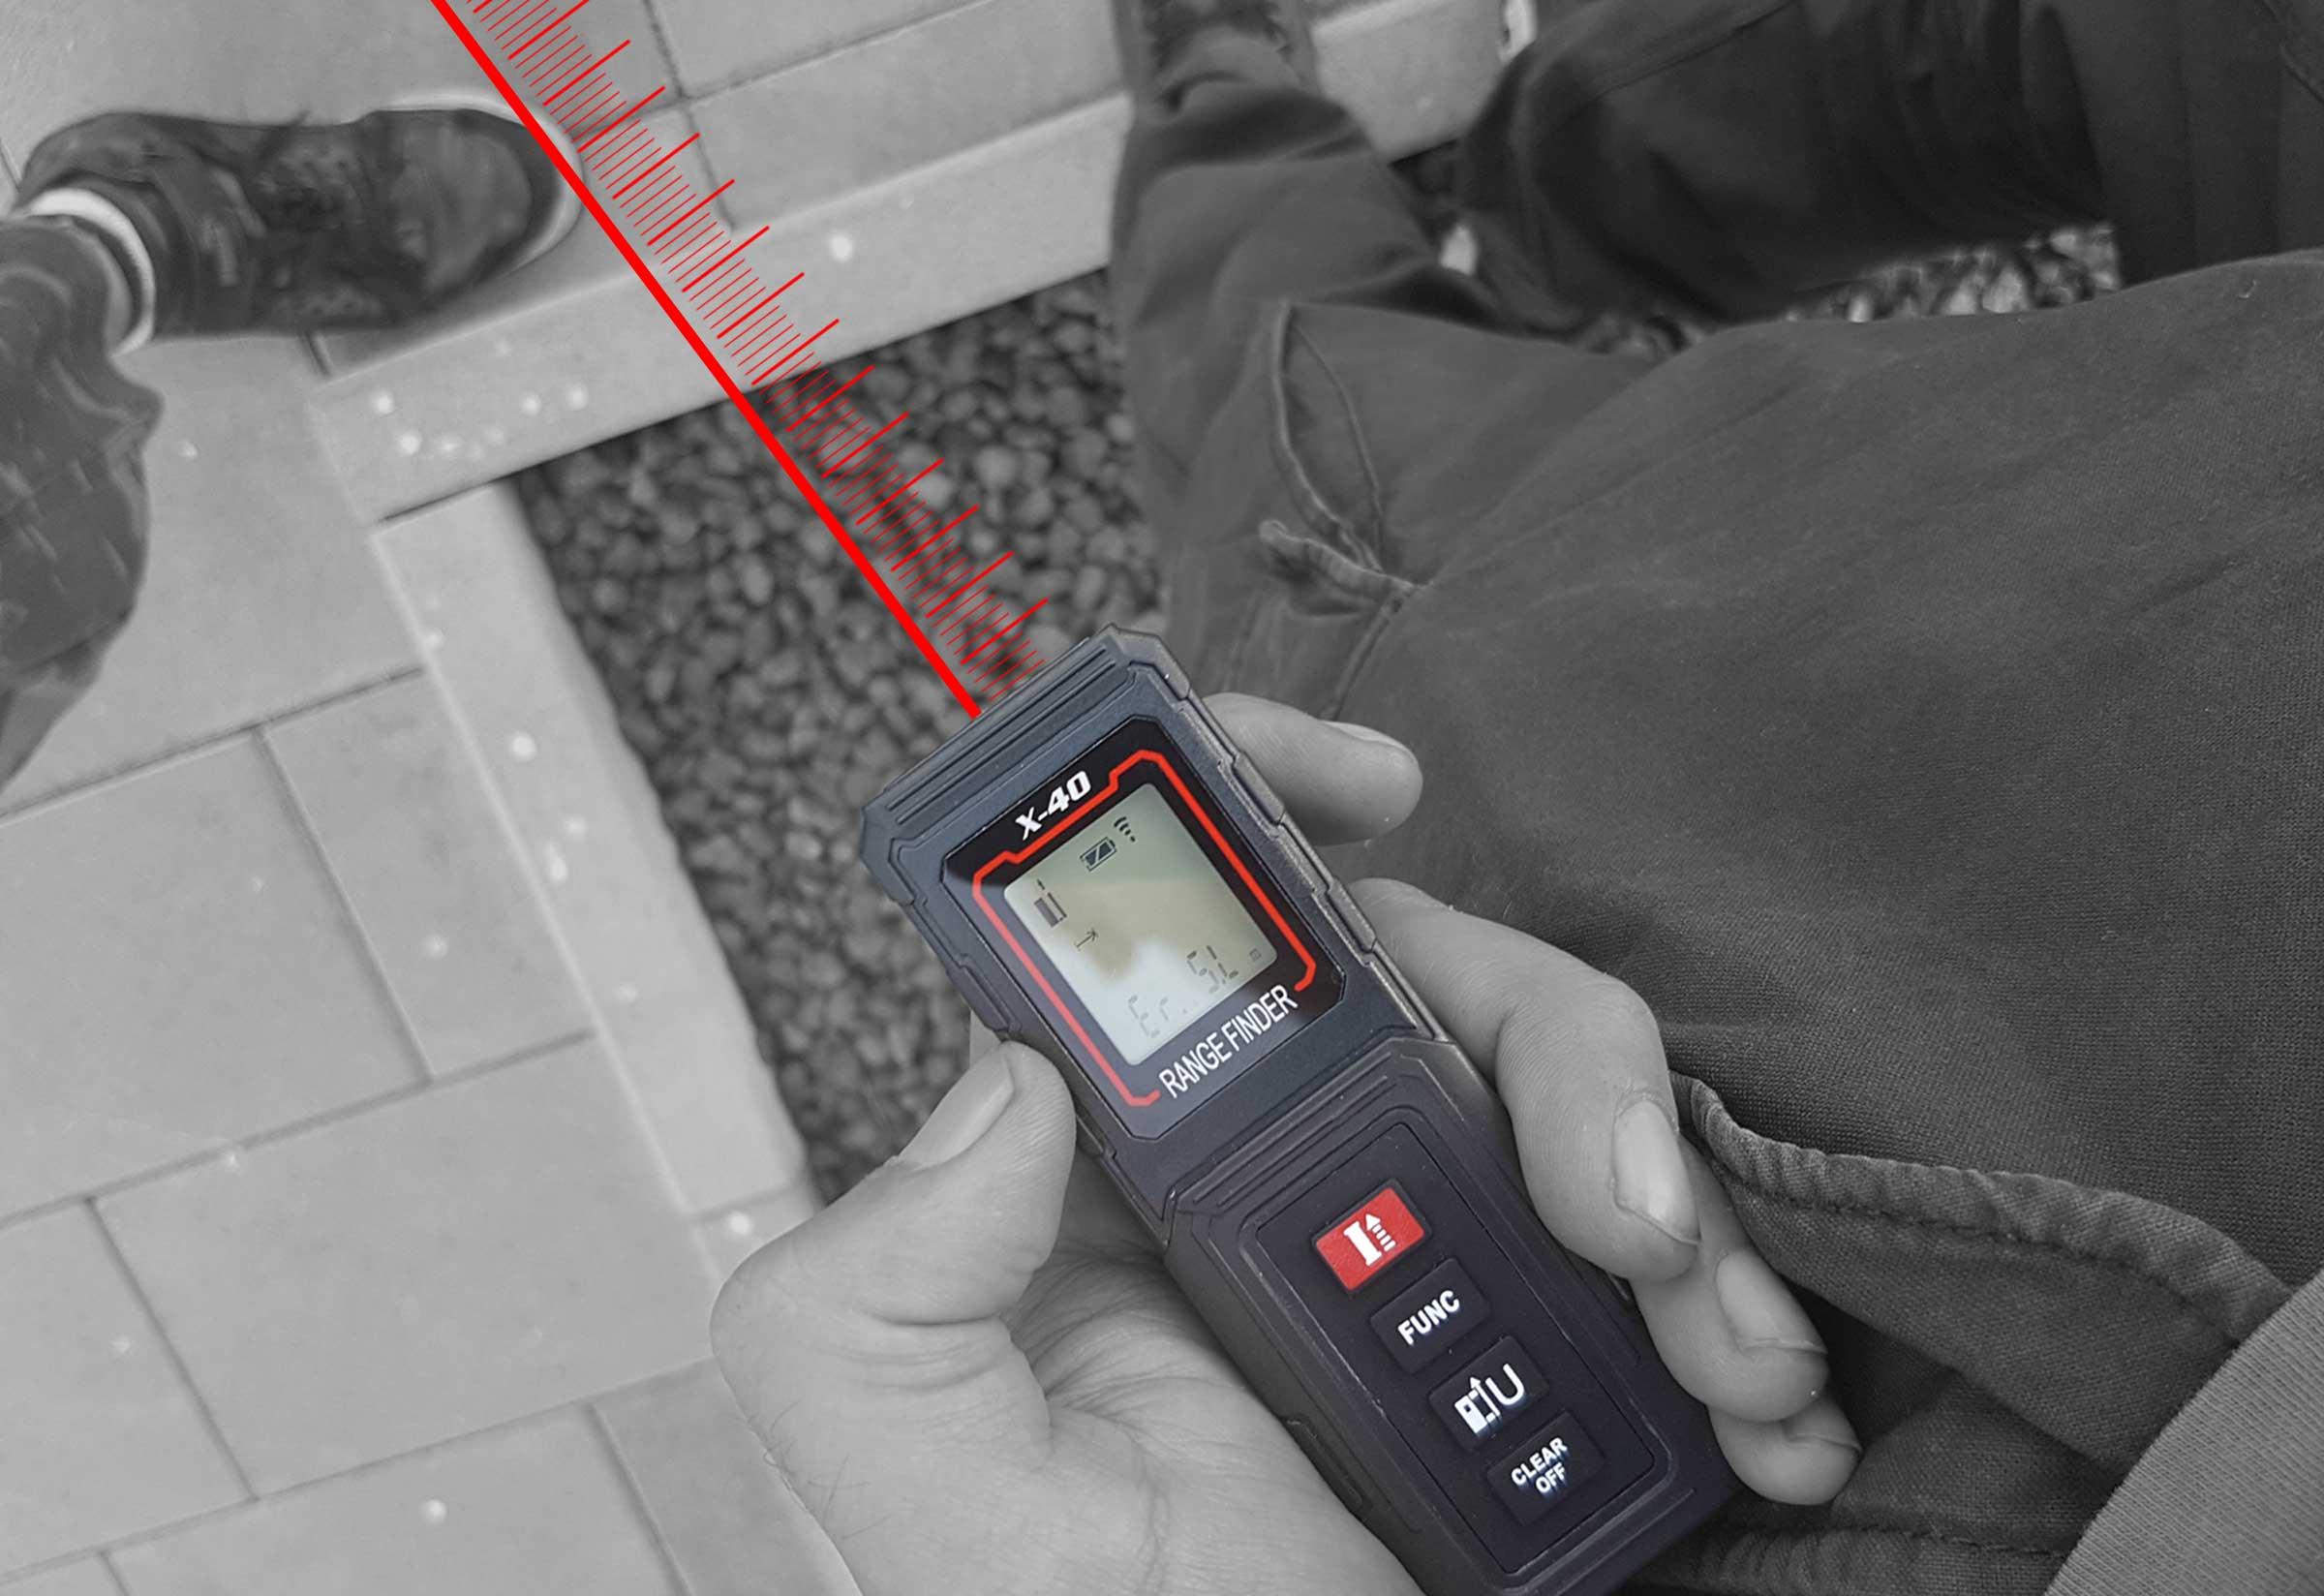 Laser Entfernungsmesser Erklärung : Zollernalb medusa zm laser distanzmessgerät entfernungsmesser